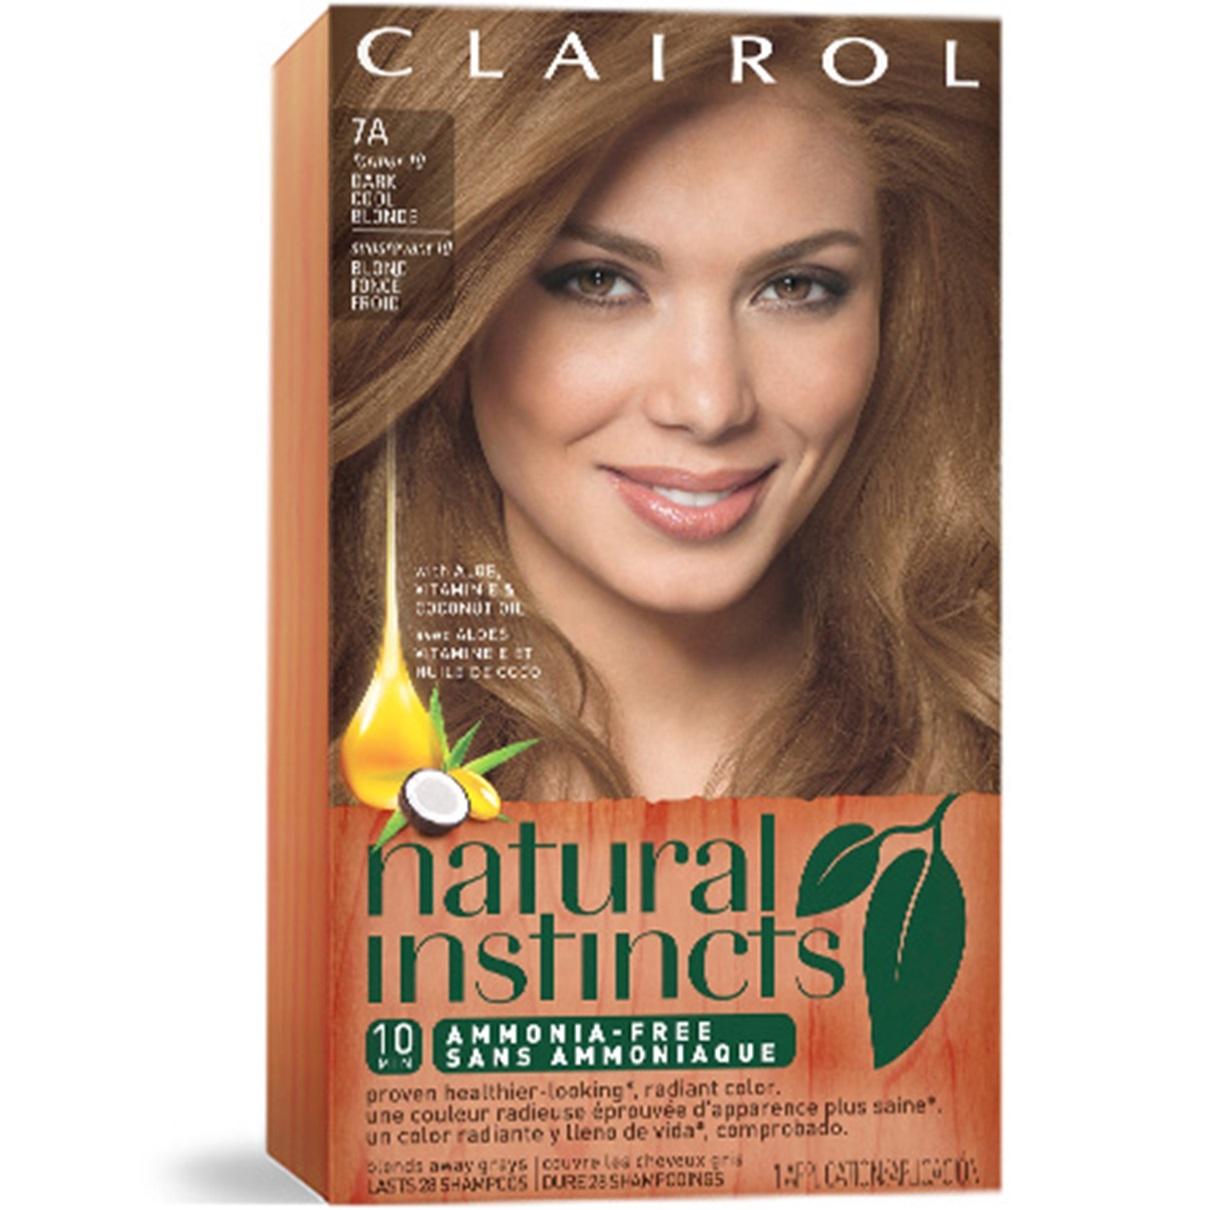 Demi-Permanent Hair Color | Clairol Natural Instincts